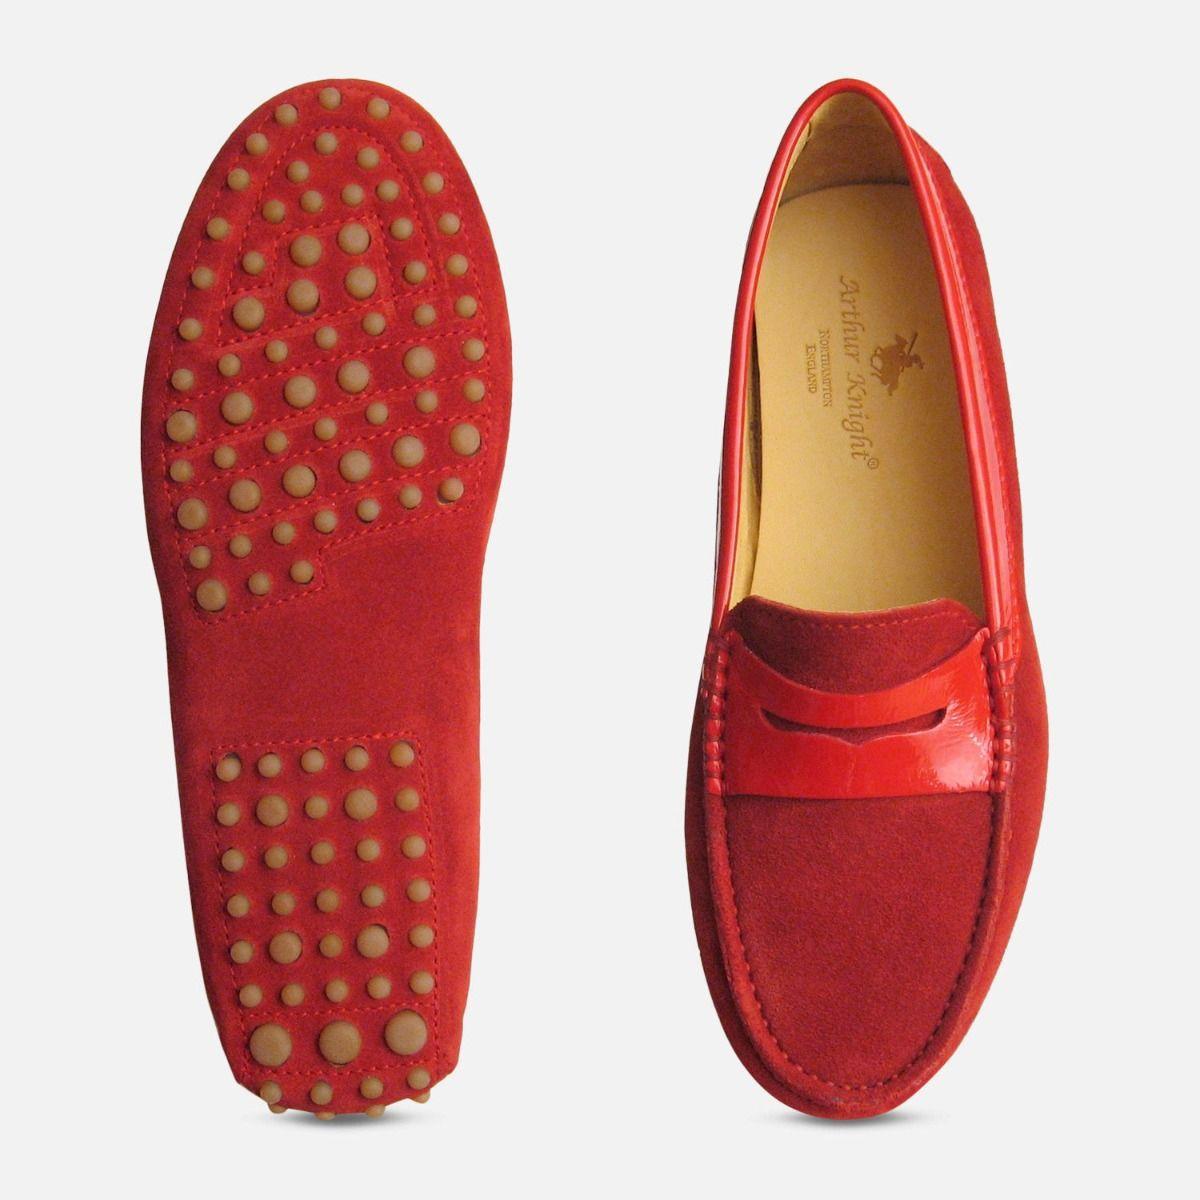 Crimson Red Suede & Patent Arthur Knight Ladies Driving Shoe Moccasins